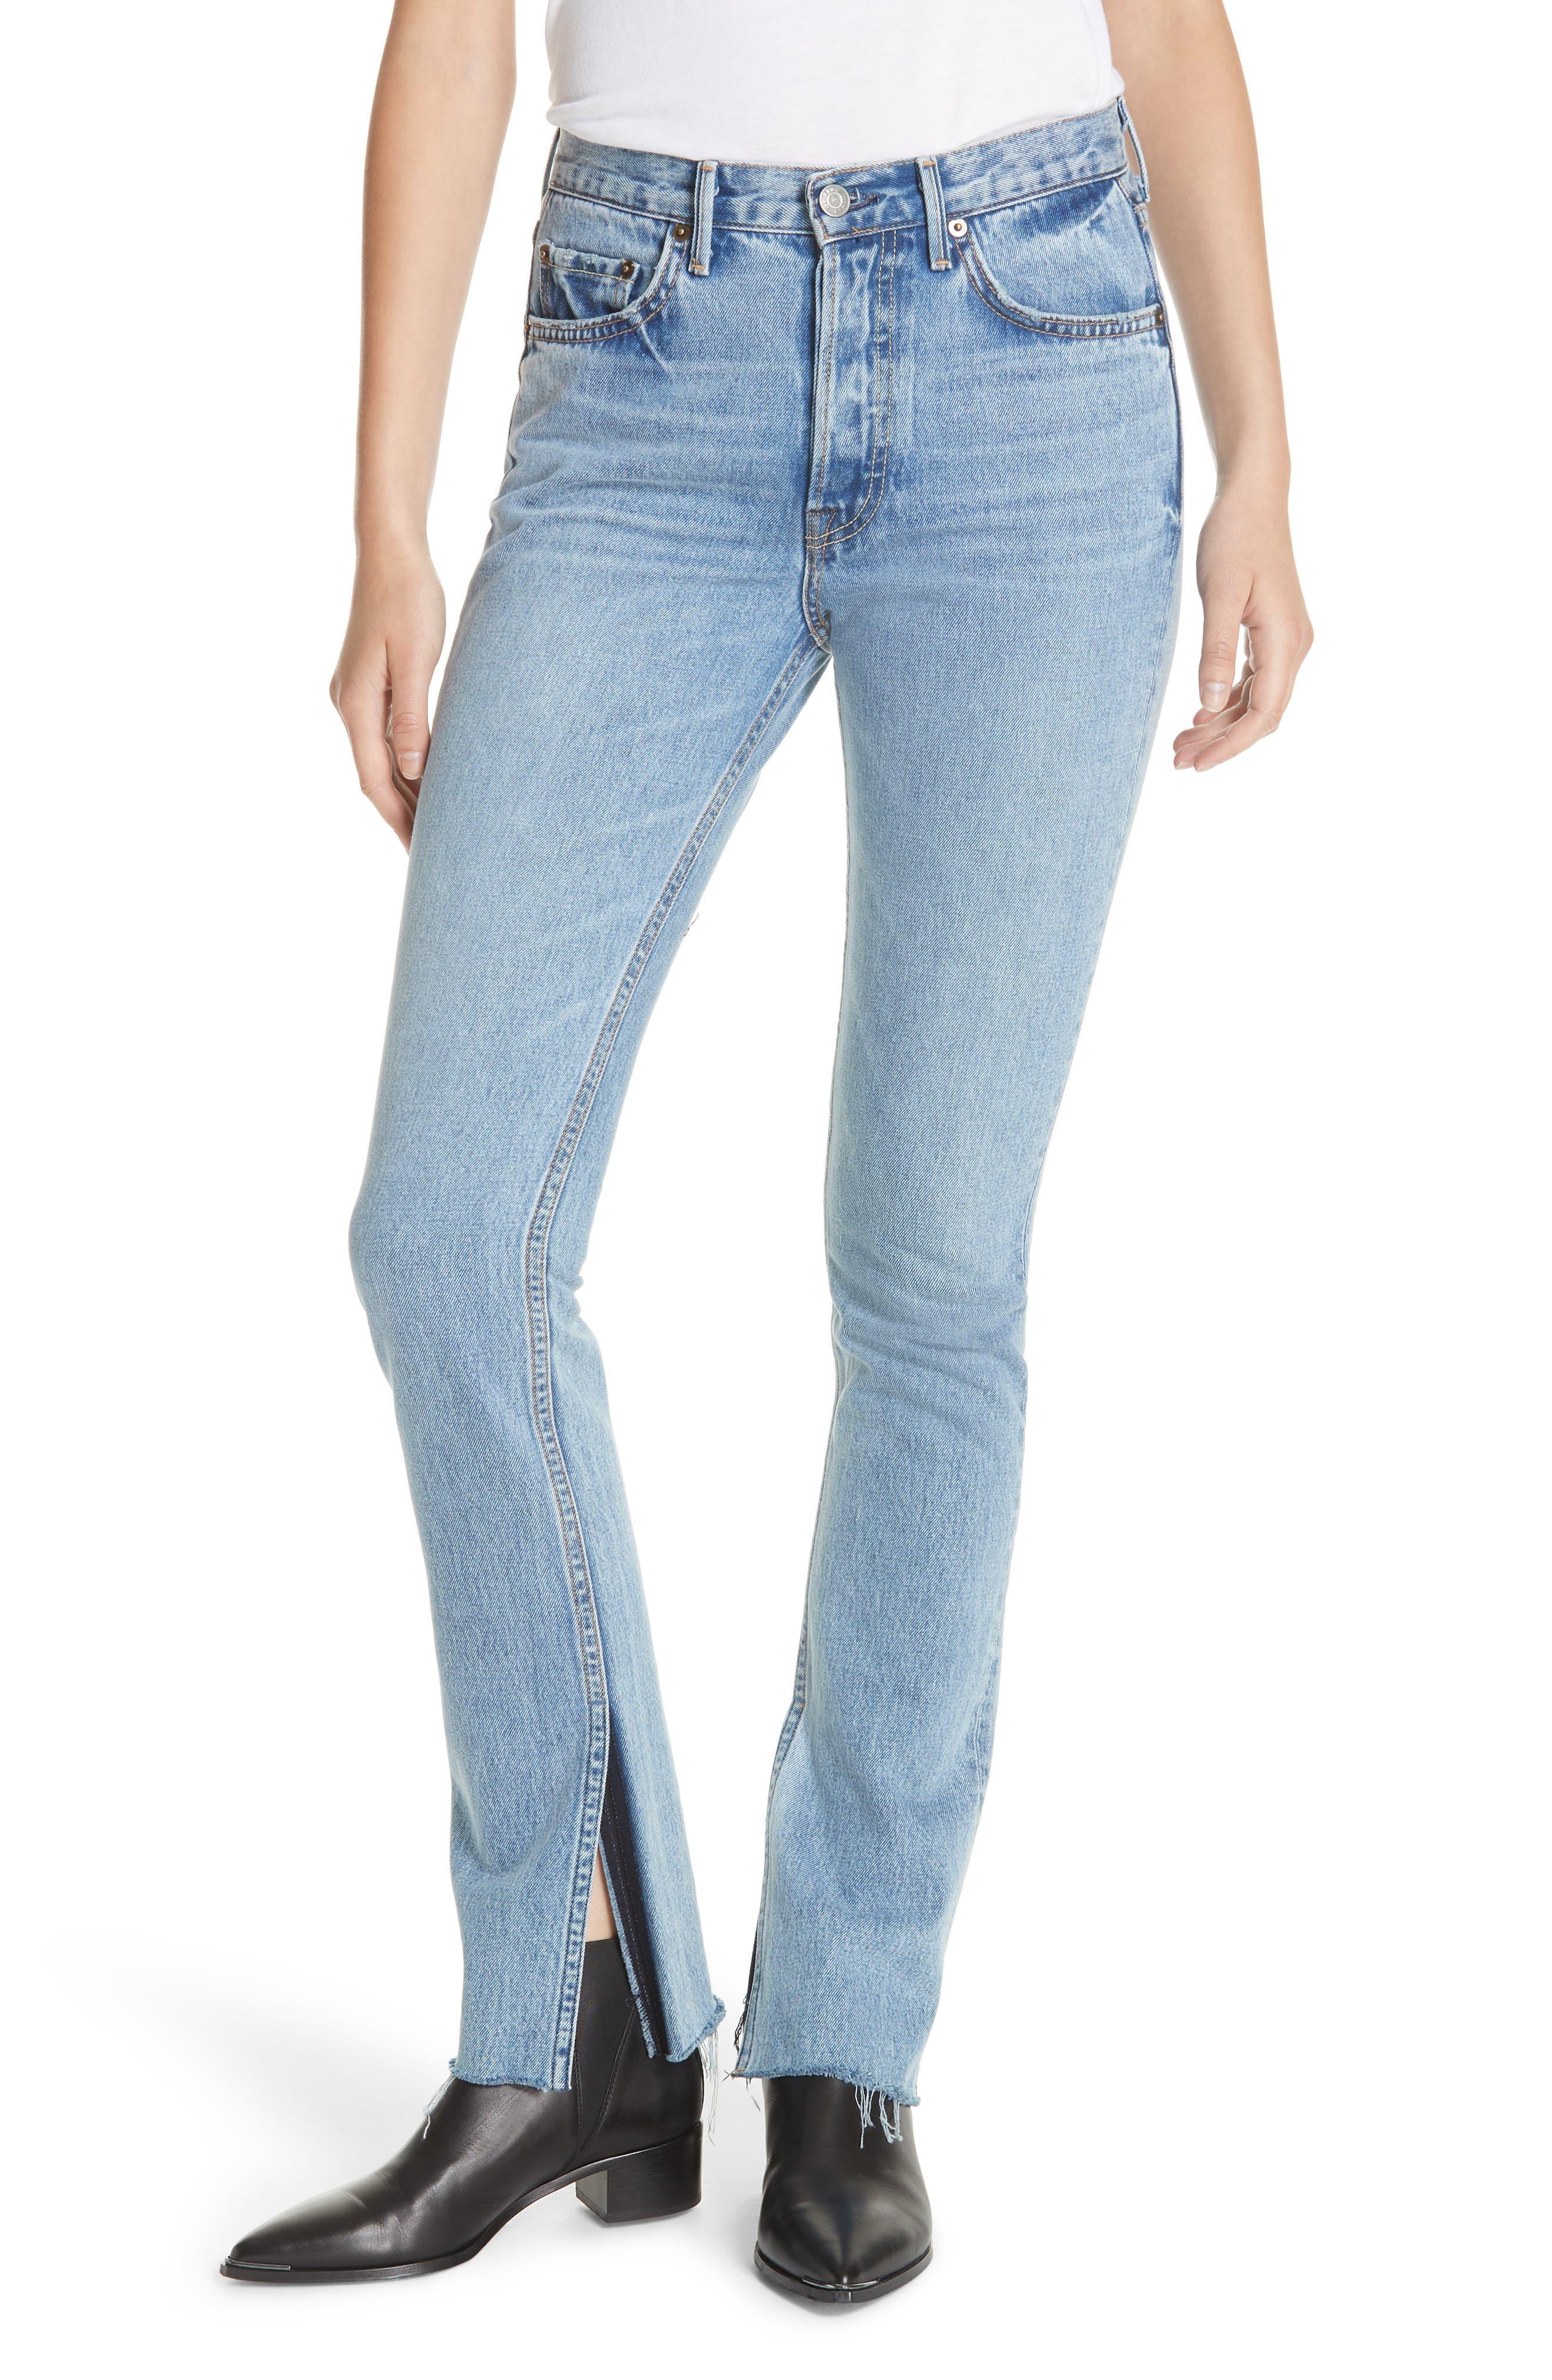 Addison Split Hem Boot Leg Jeans by Grlfrnd